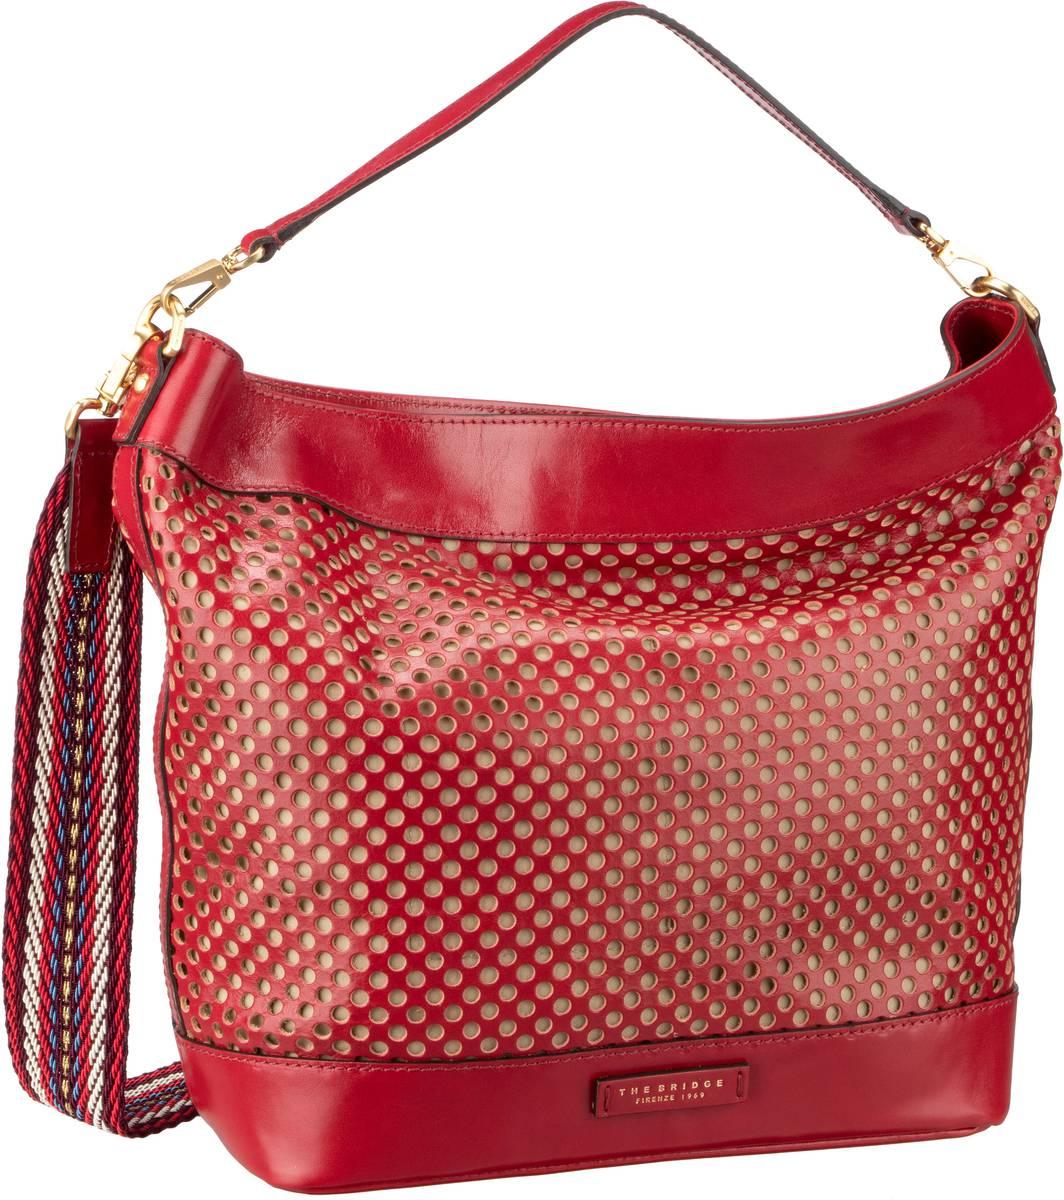 Handtasche Palmaiola Hobo Bag 2809 Rosso Ciliegia/Oro